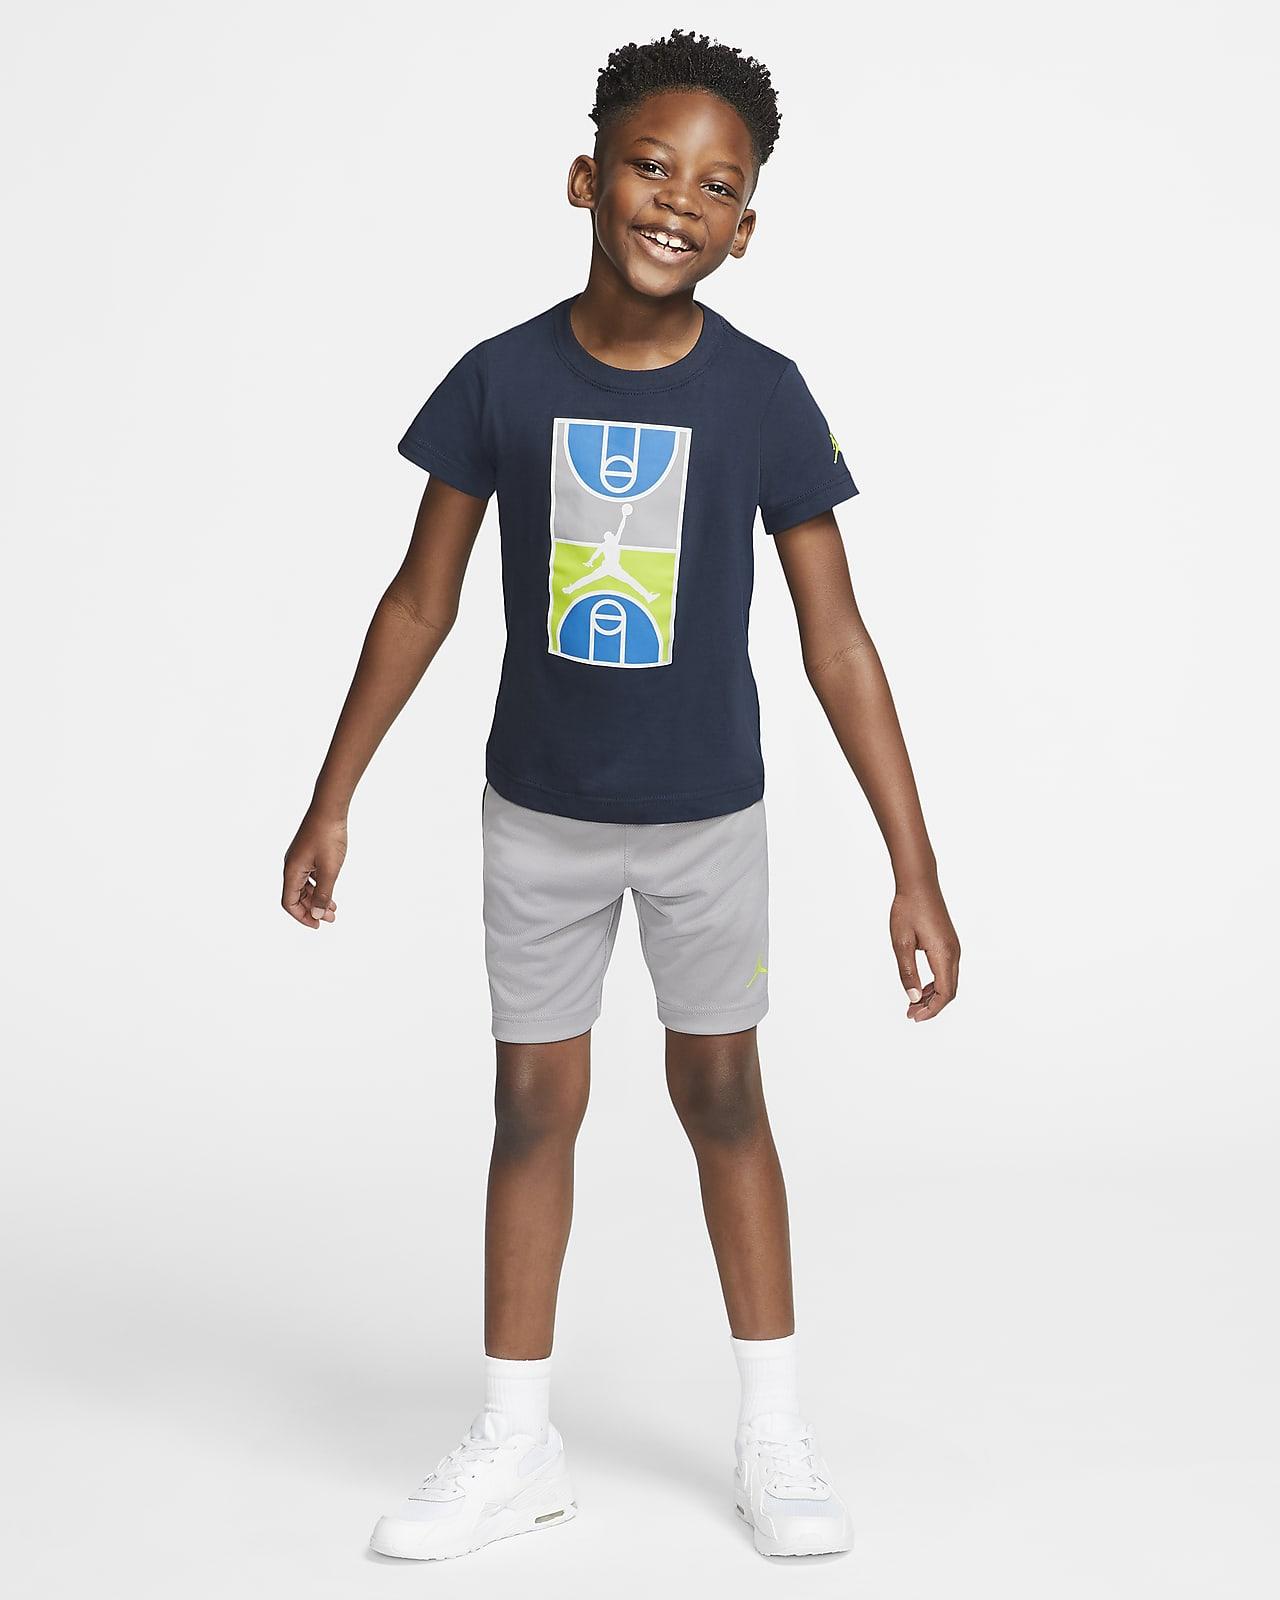 T-Shirt and Shorts Set. Nike GB